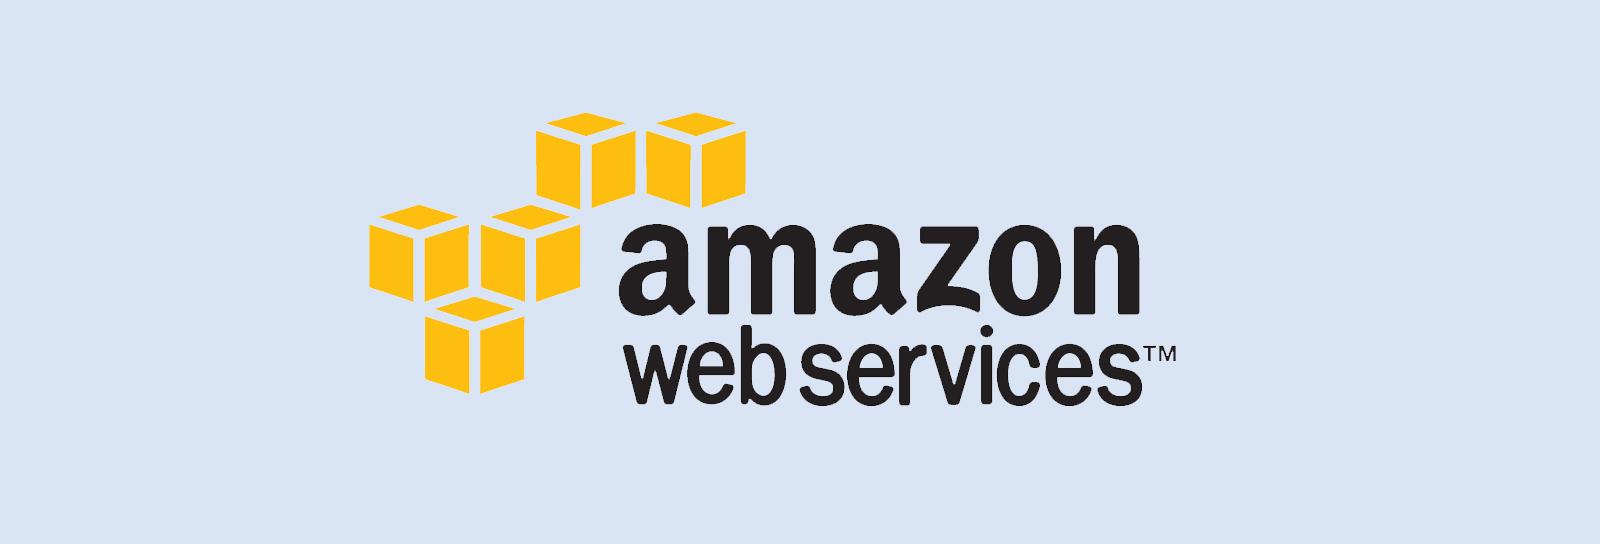 Amazon AWS Cloud Services